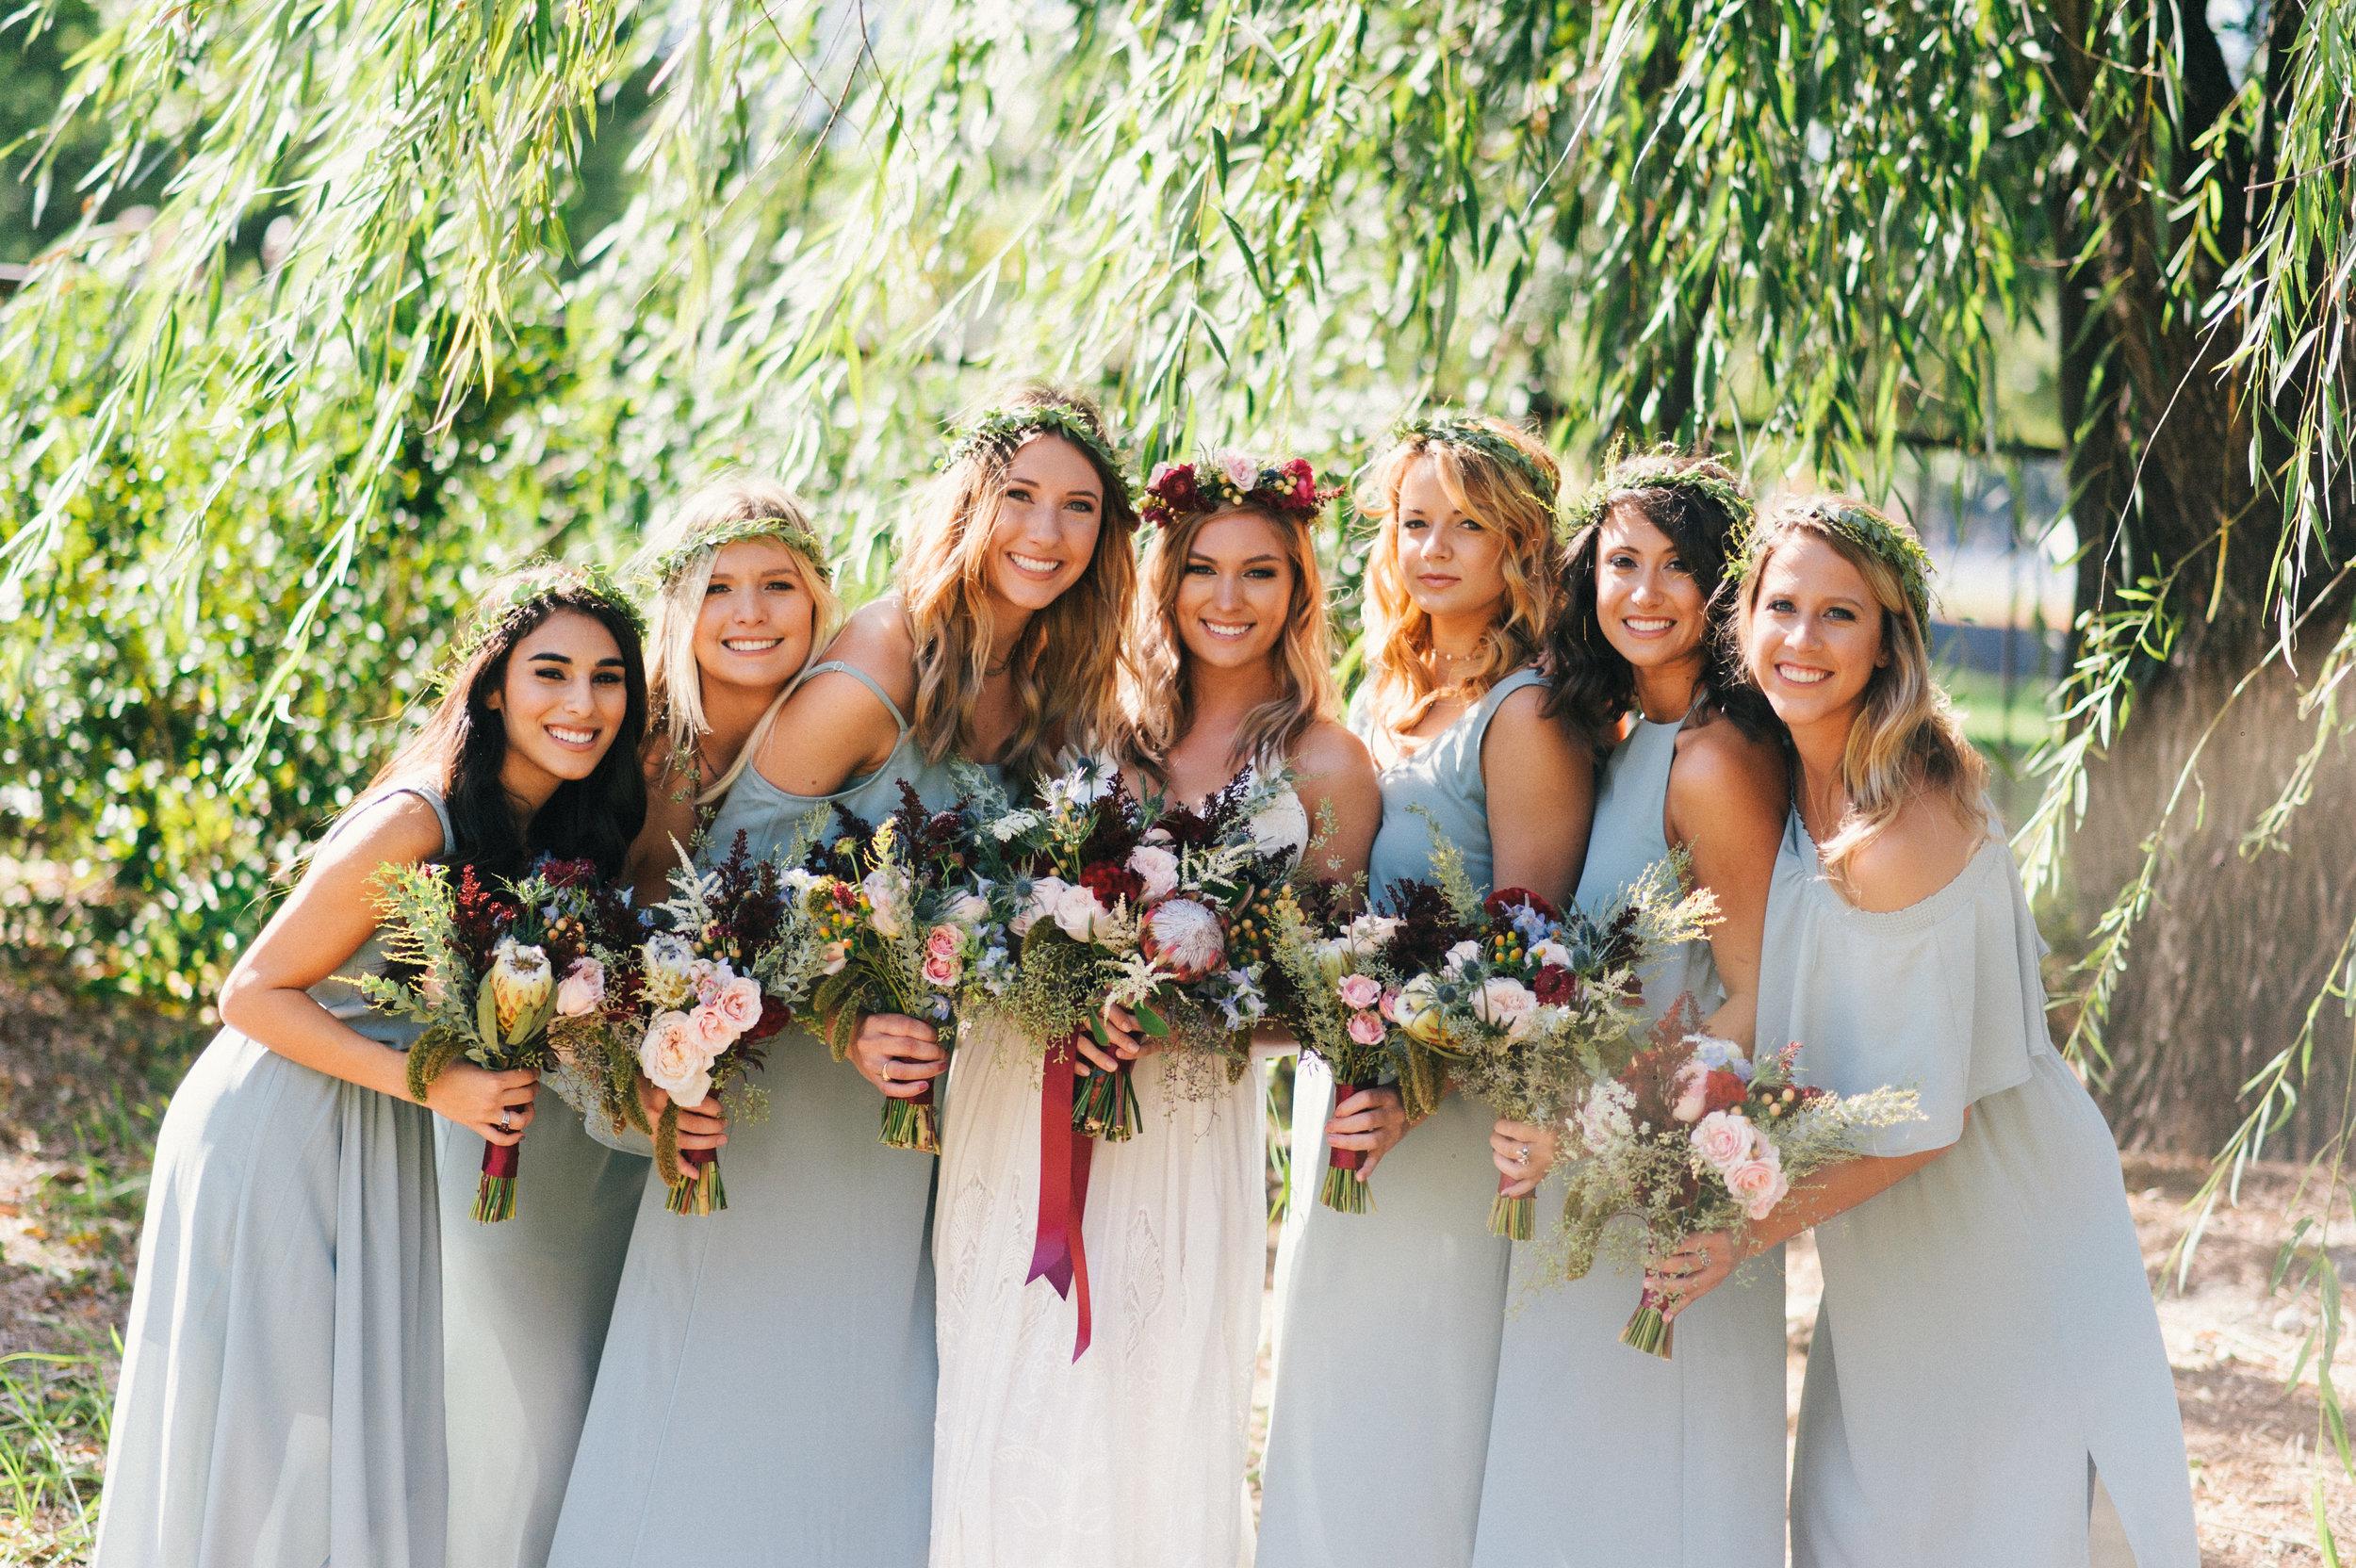 kristin-and-peter-atlanta-georgia-wedding-october-8th-2016 (21 of 1068).jpg